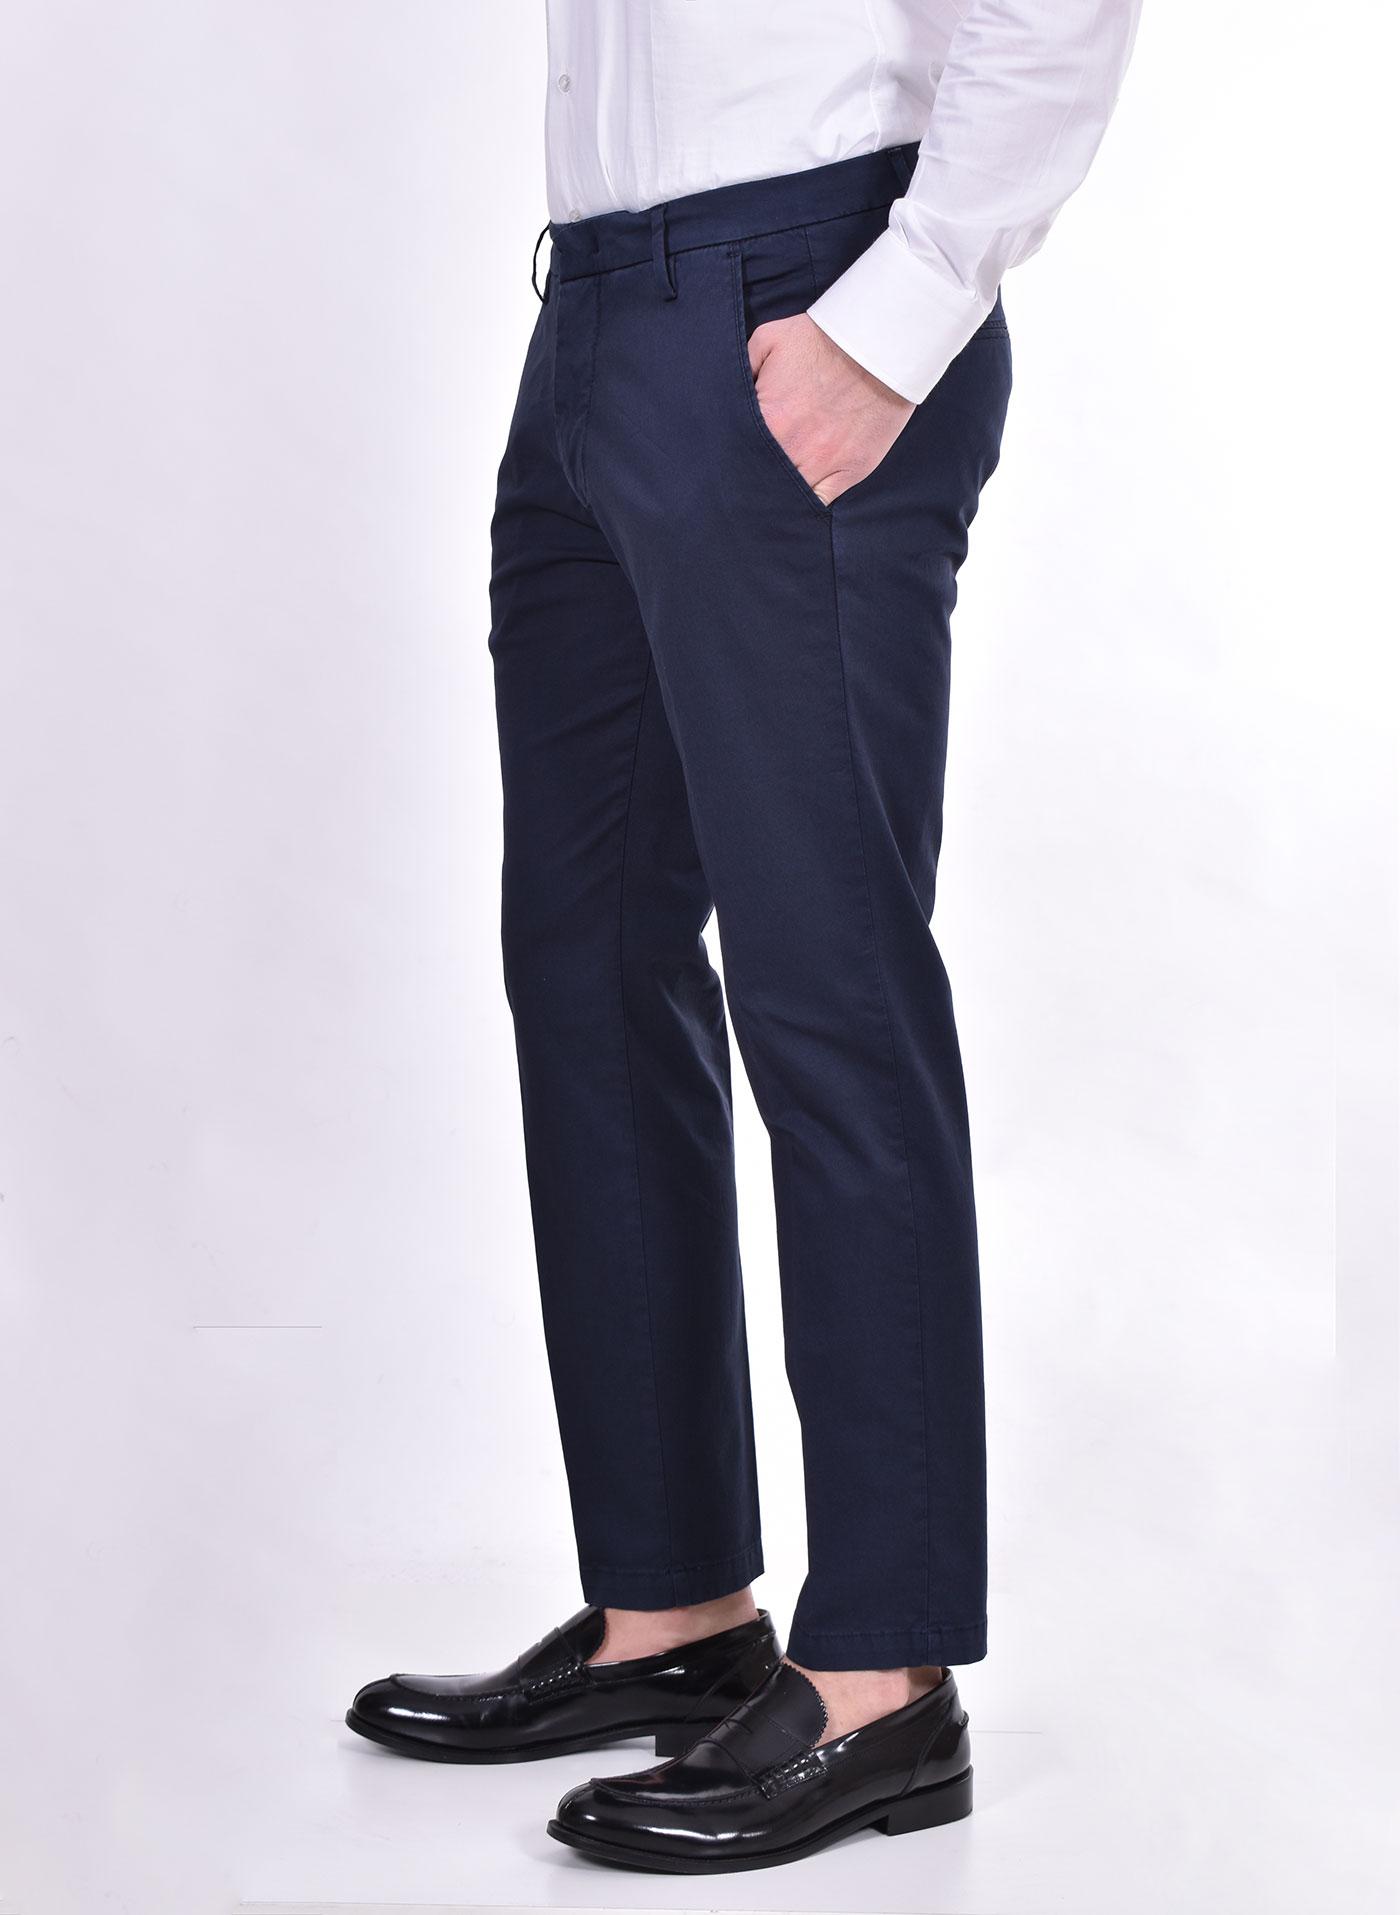 Pantalone Bro Ship campri miami blu BRO SHIP | BSMIA8221001